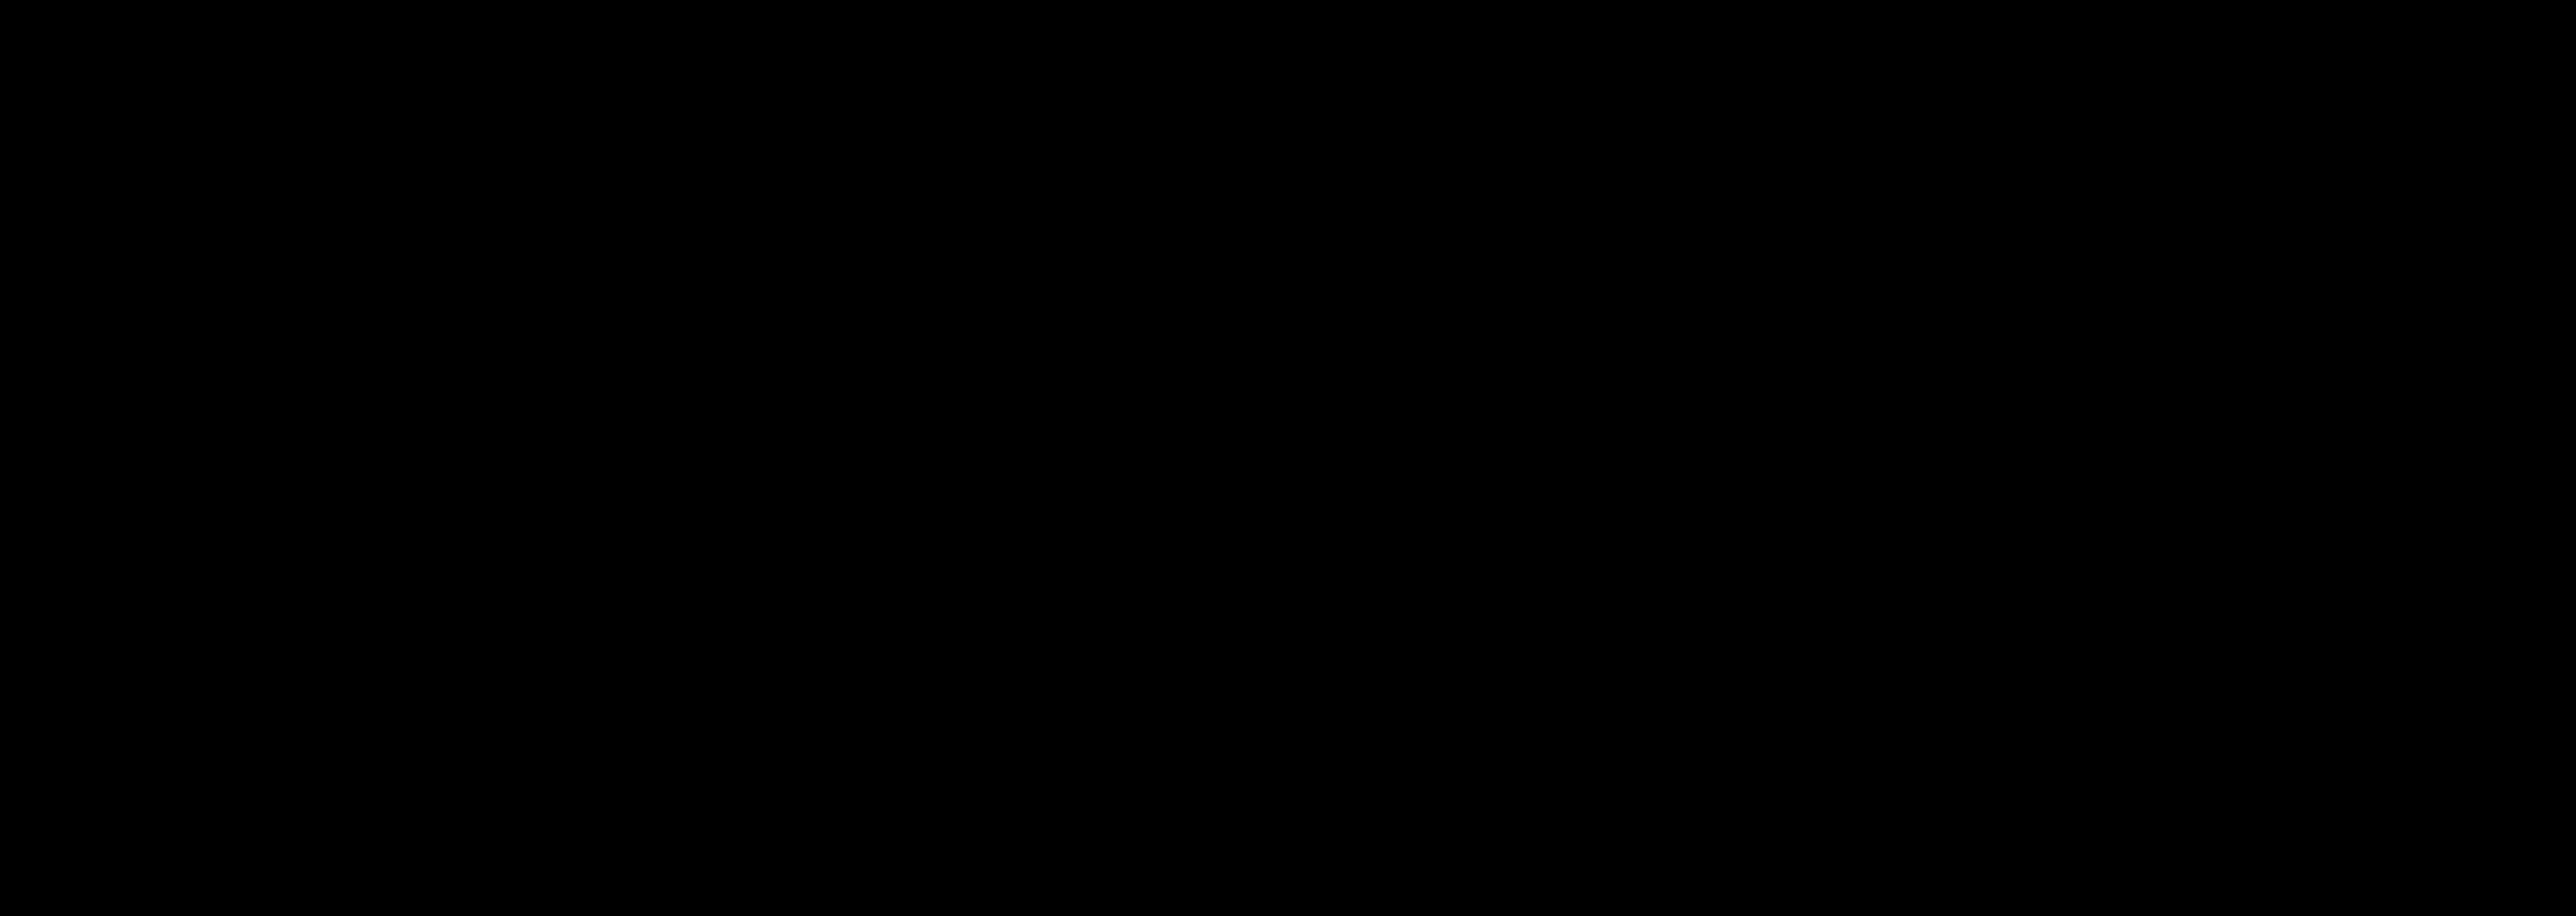 A future with hope logo